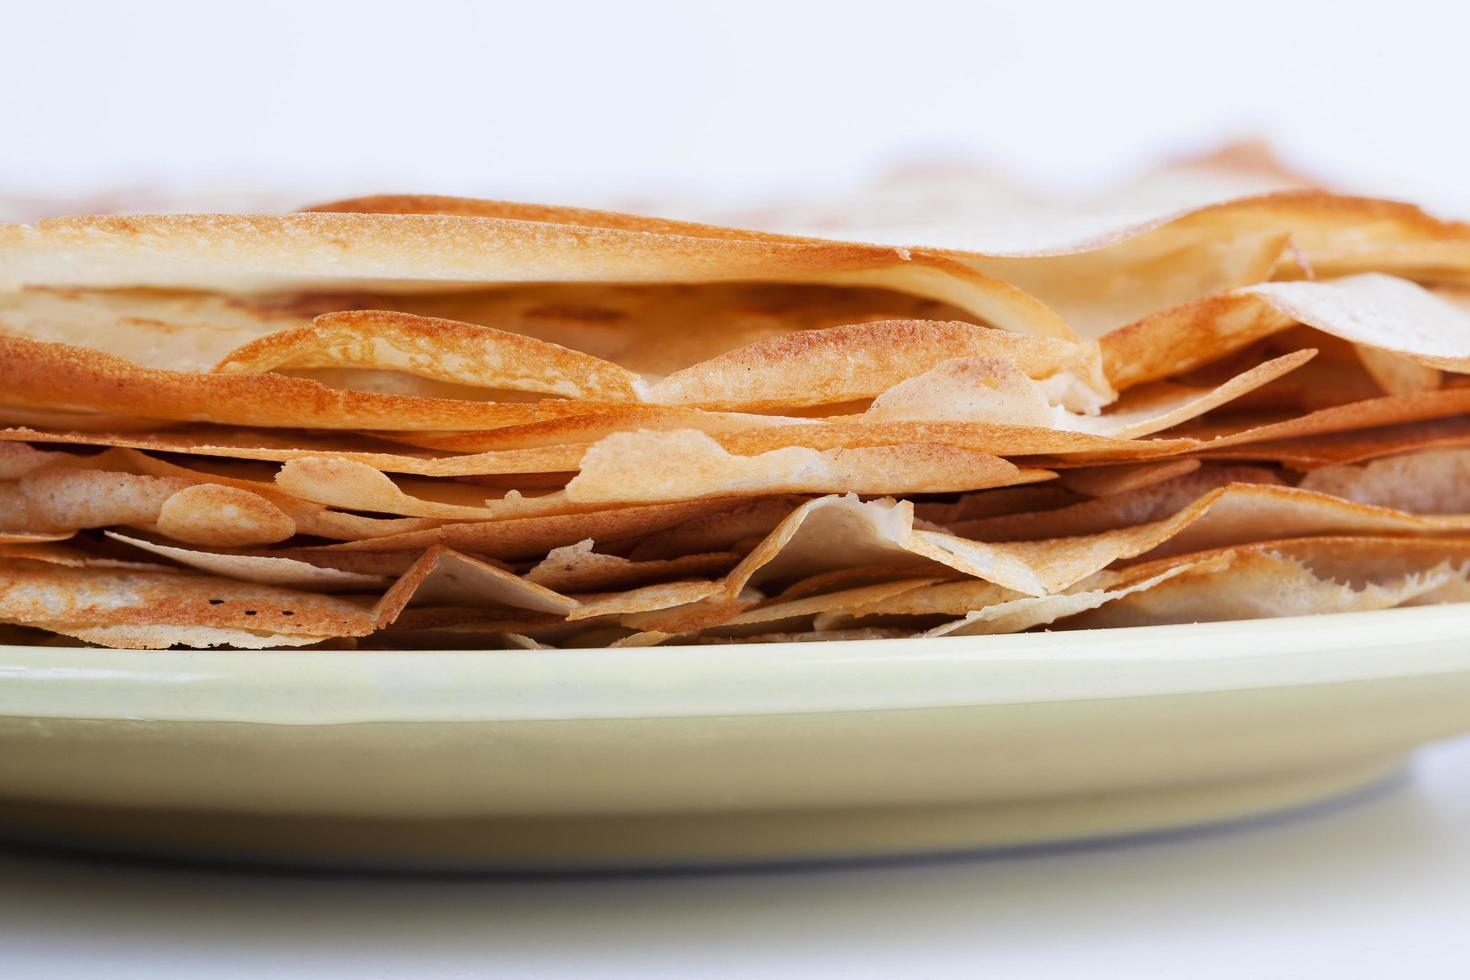 pila de panqueques se encuentra en un plato foto